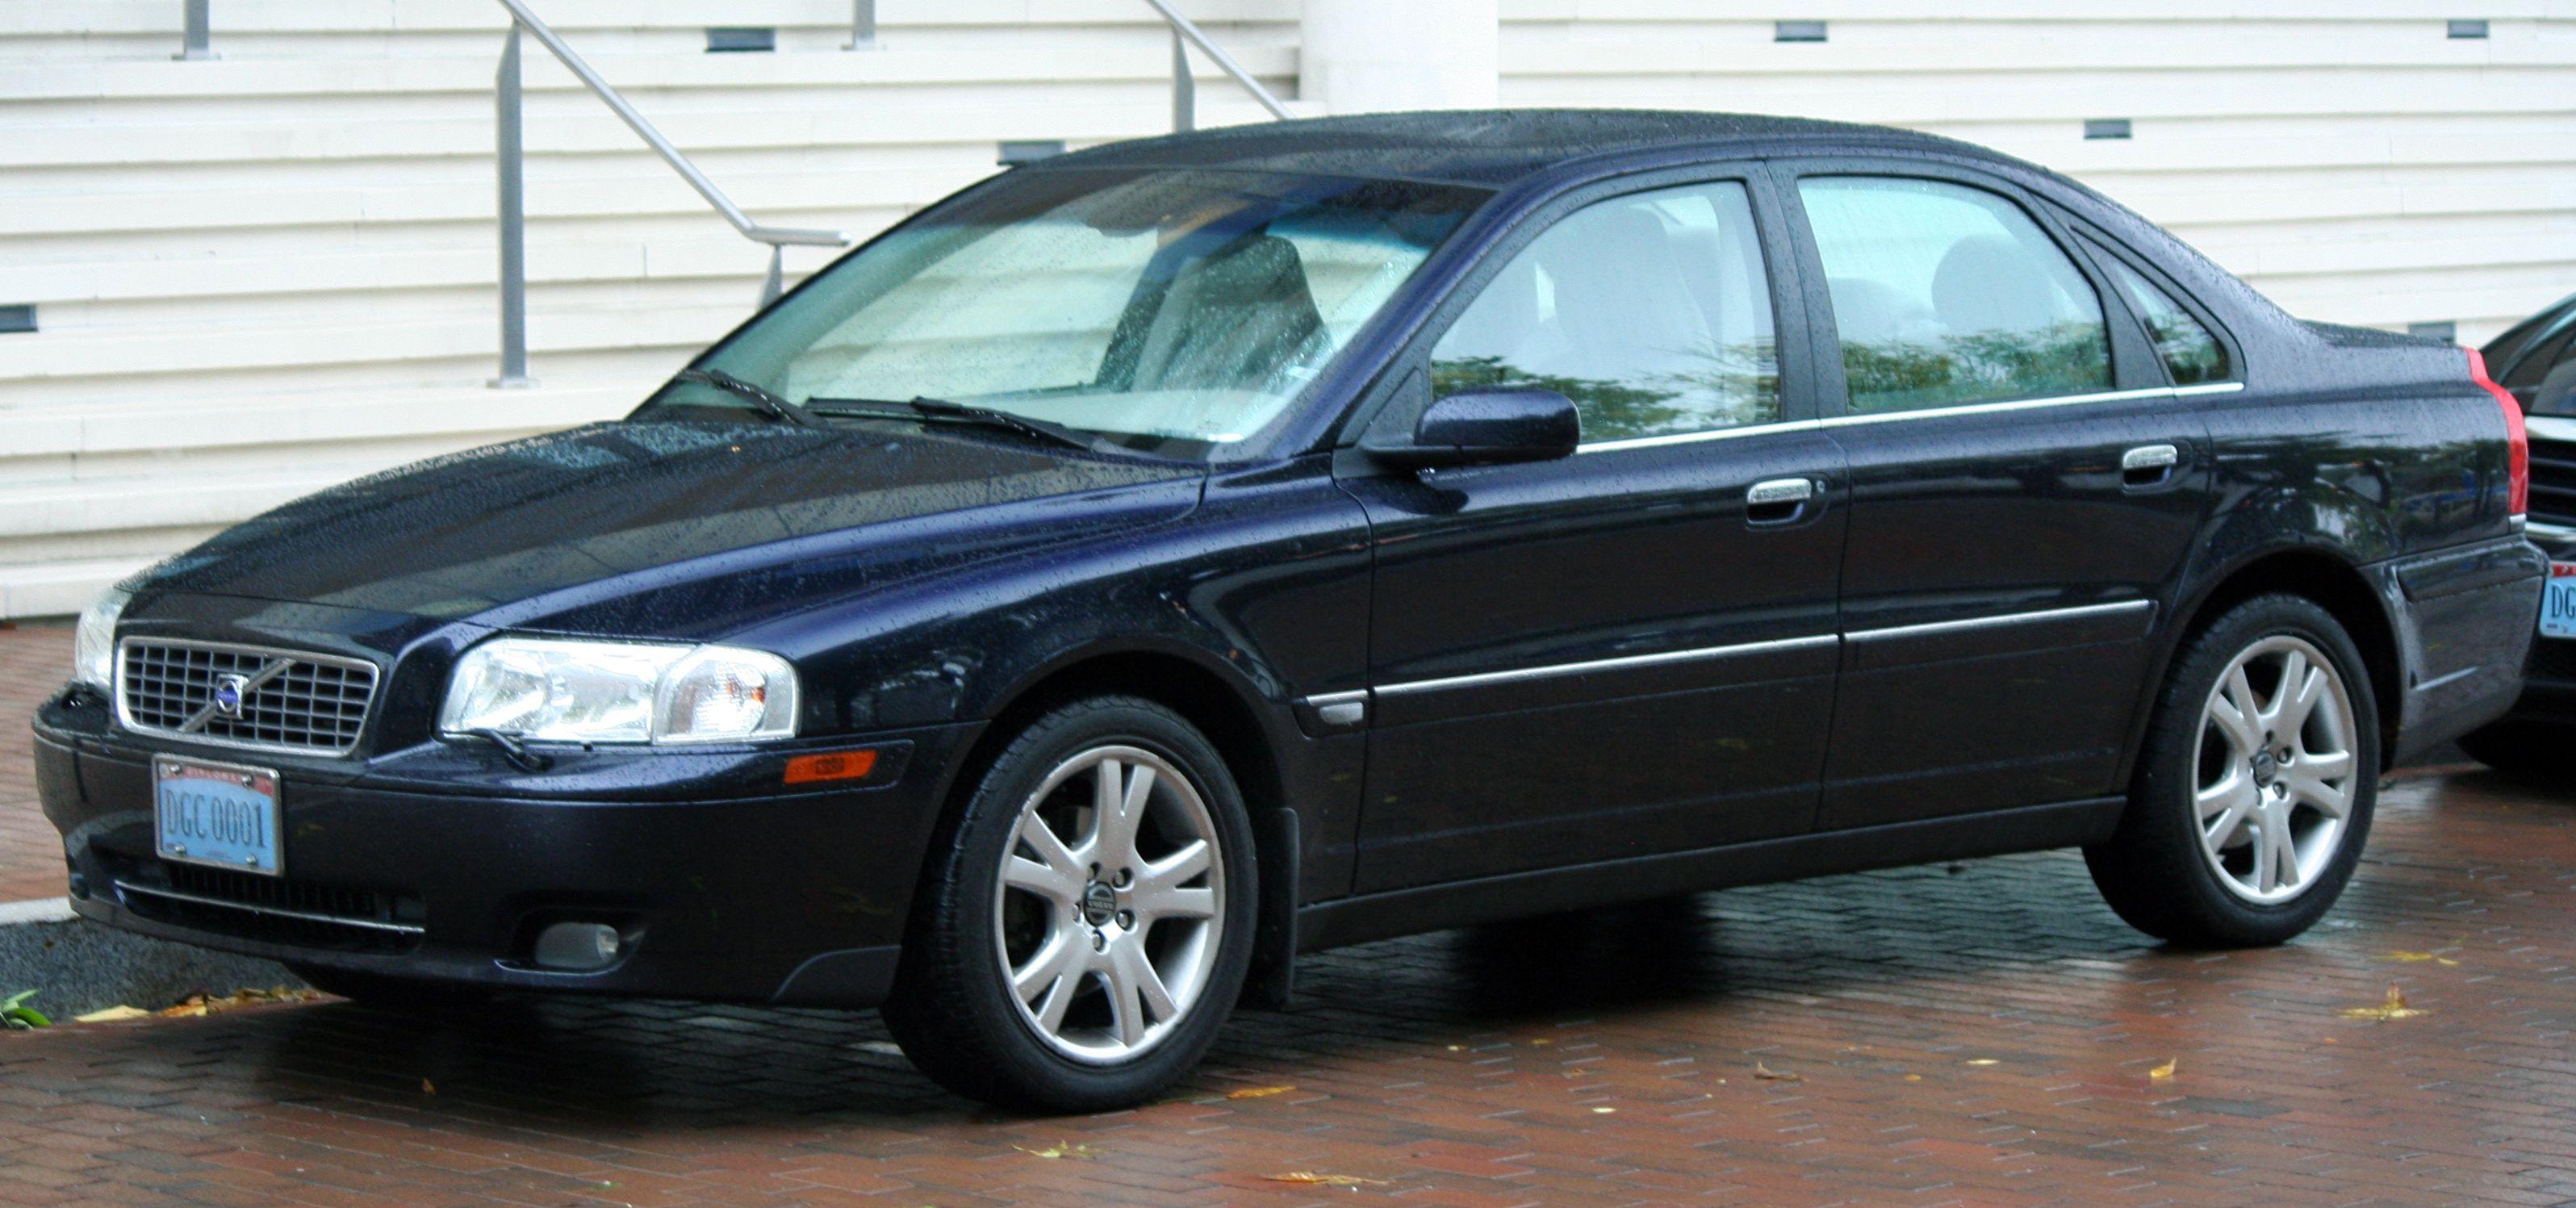 Volvo S80 - Wikipedia, the free encyclopedia   1999 VOLVO